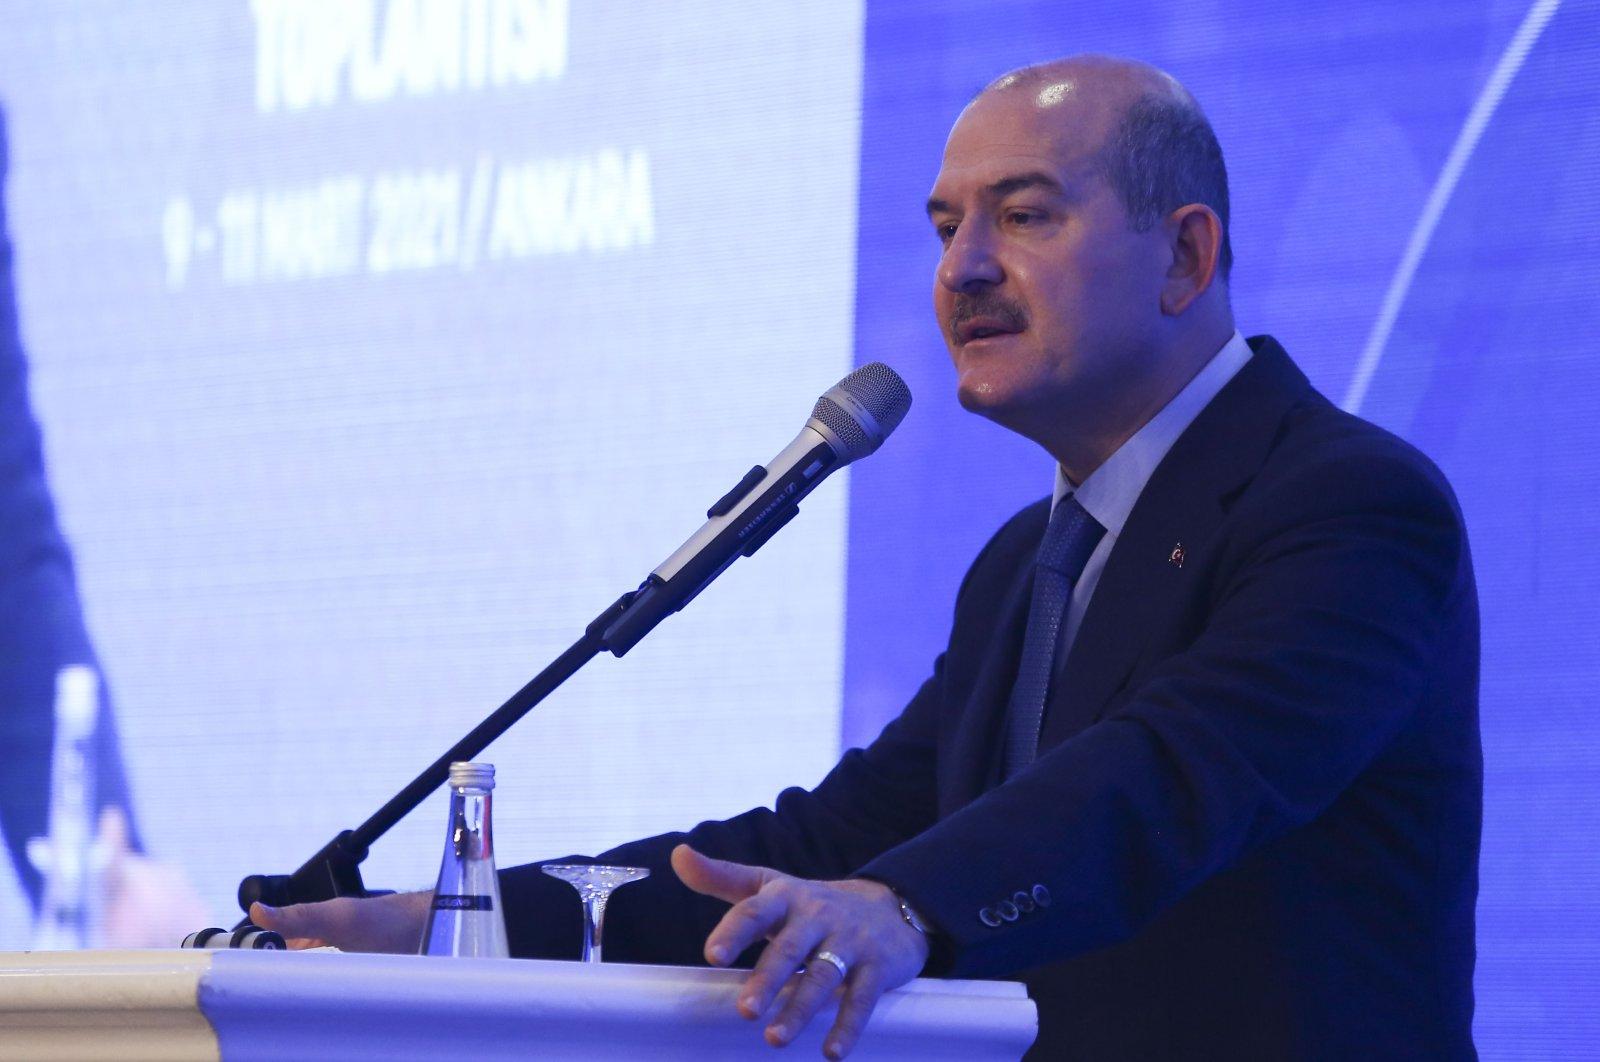 Interior Minister Süleyman Soylu speaks in the capital Ankara, Turkey, March 9, 2021. (İHA Photo)